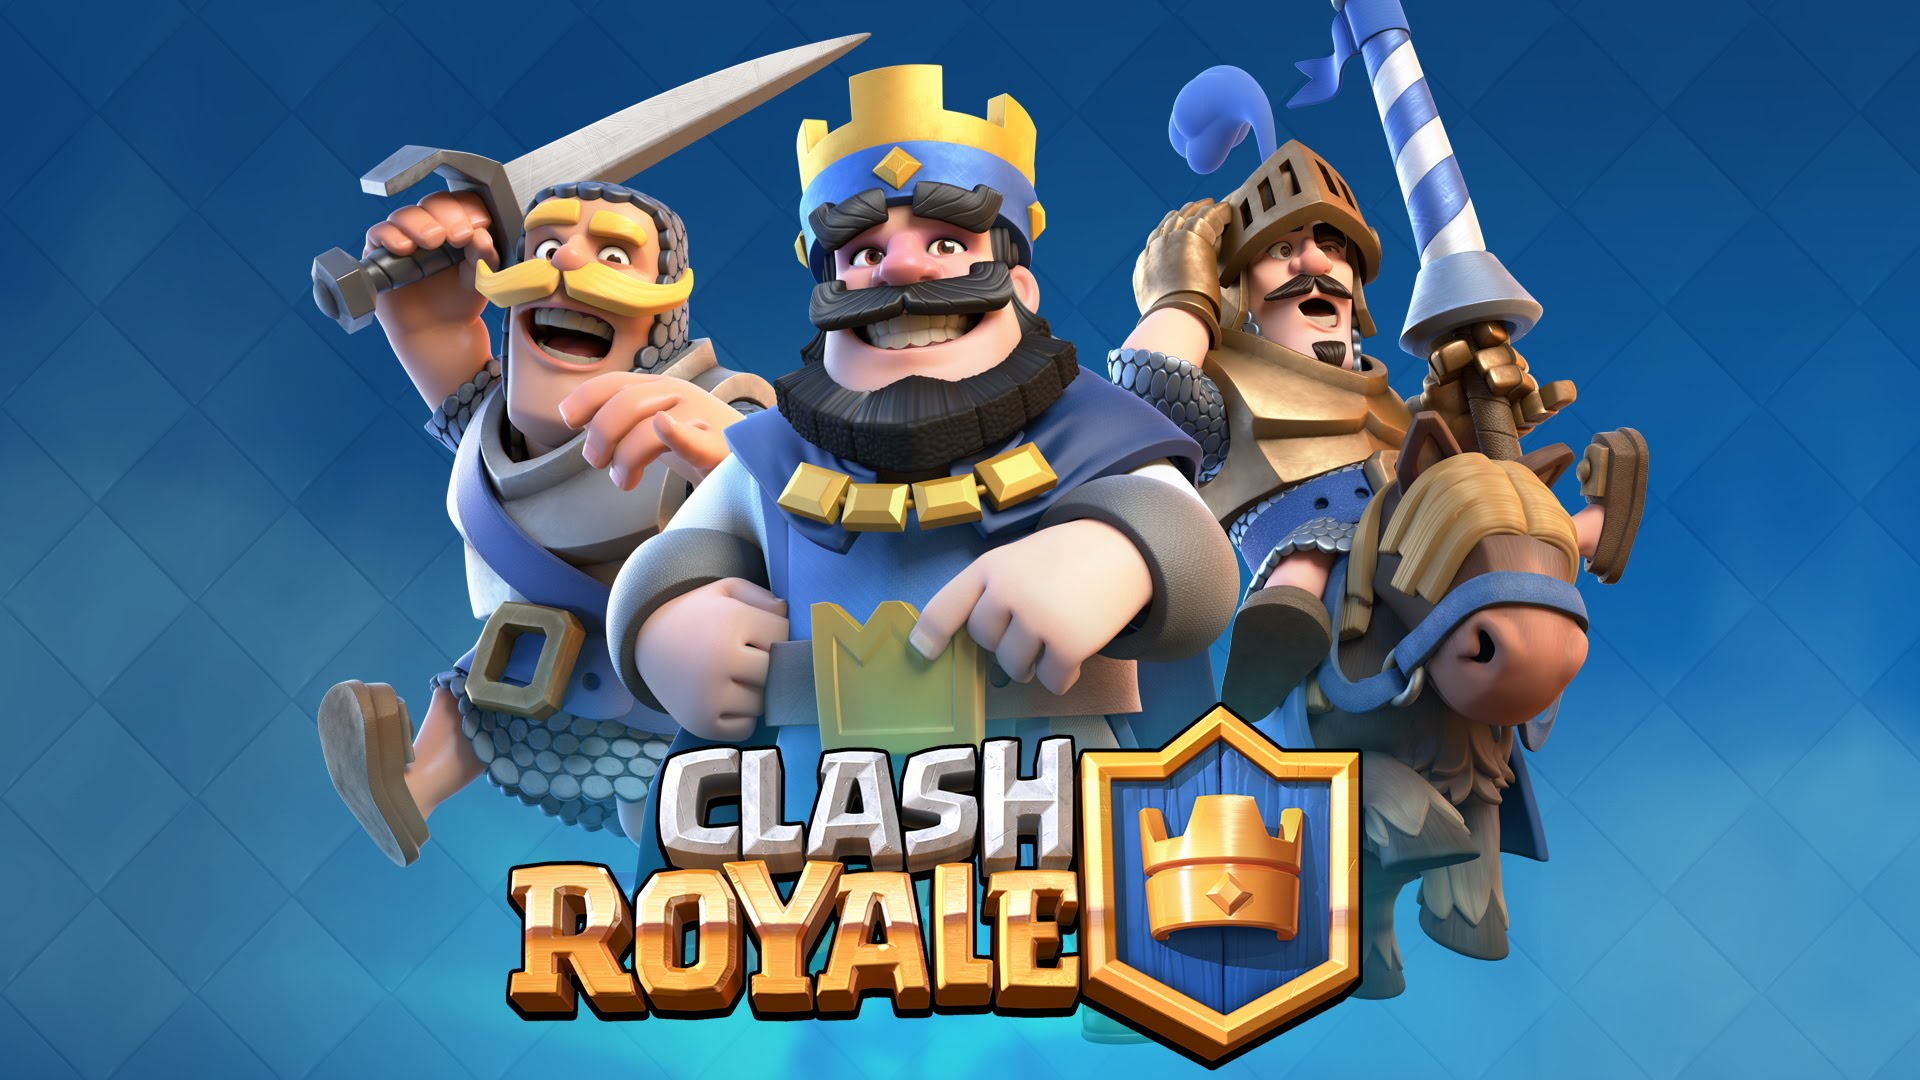 Próxima actualización del Clash Royale a partir de mañana